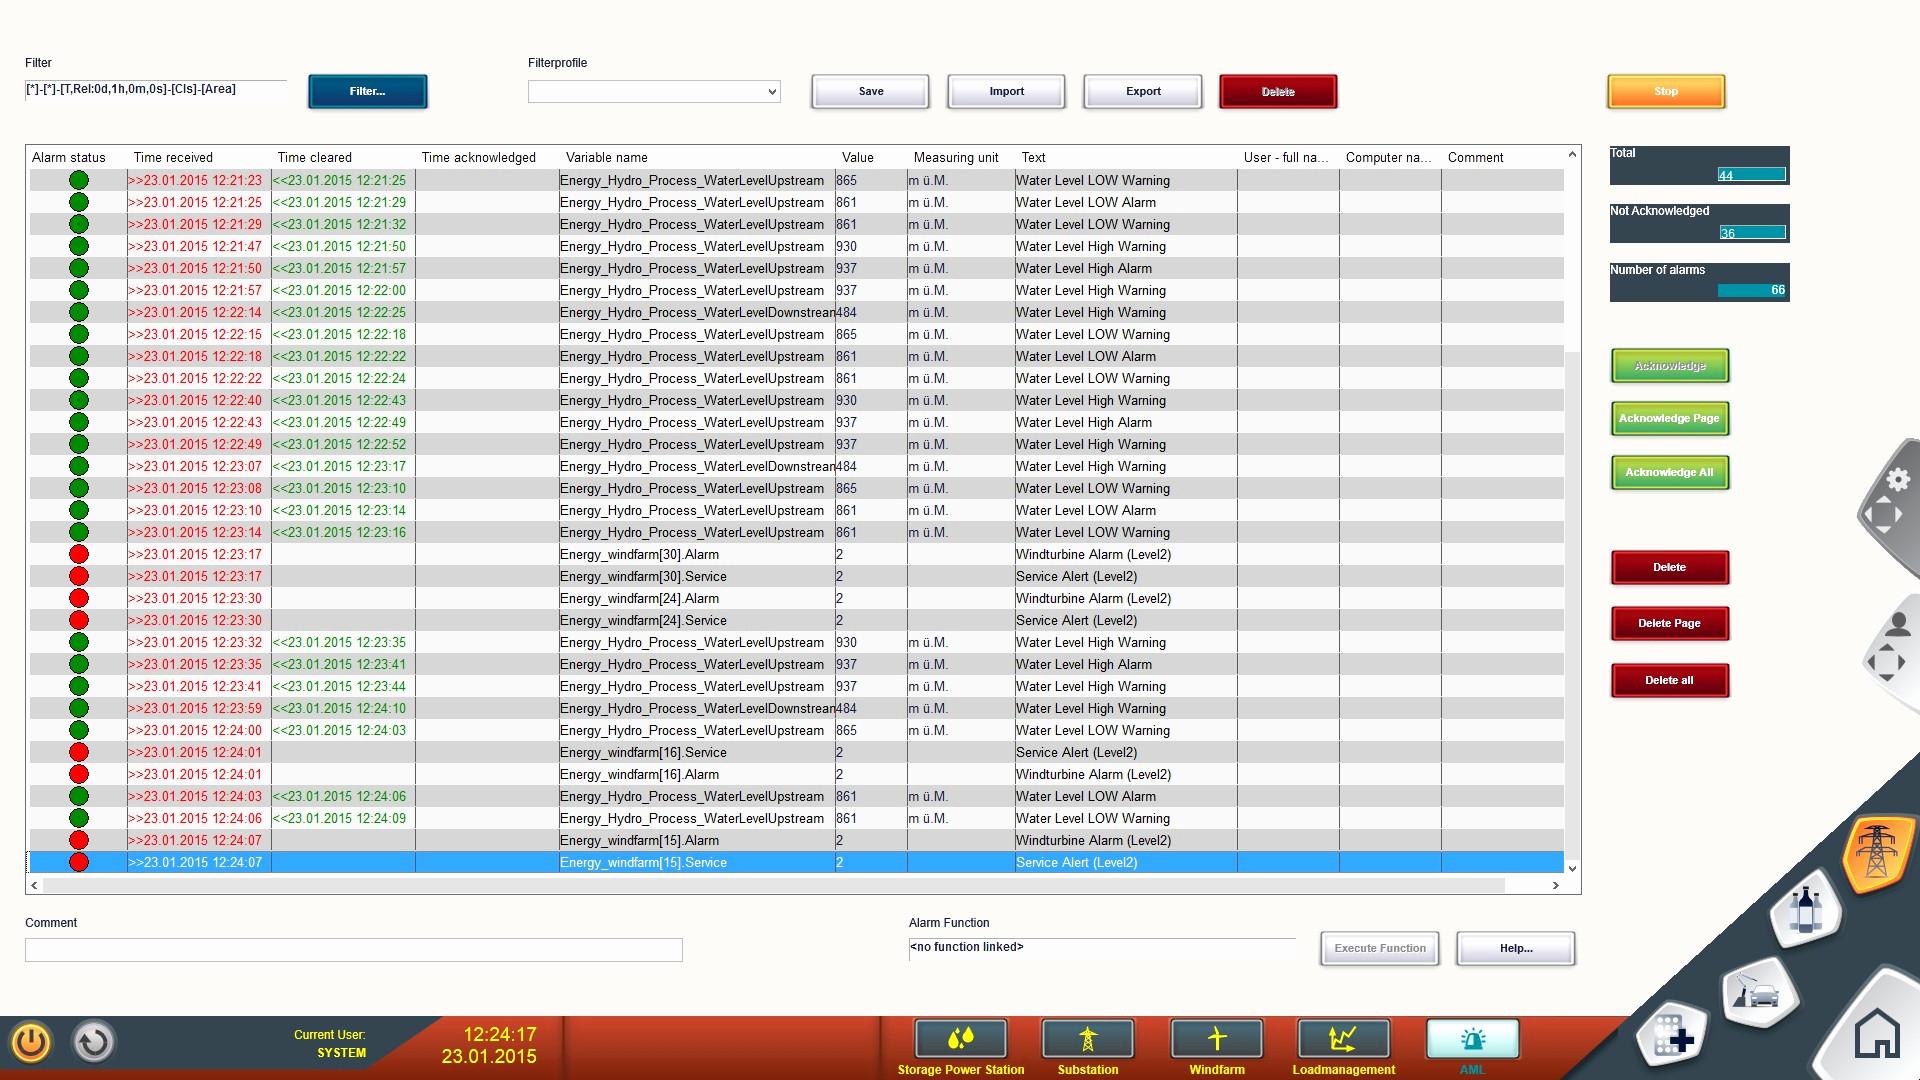 Can You Do A Spreadsheet On An Ipad For Can I Do Spreadsheets On An Ipad  Islamopedia